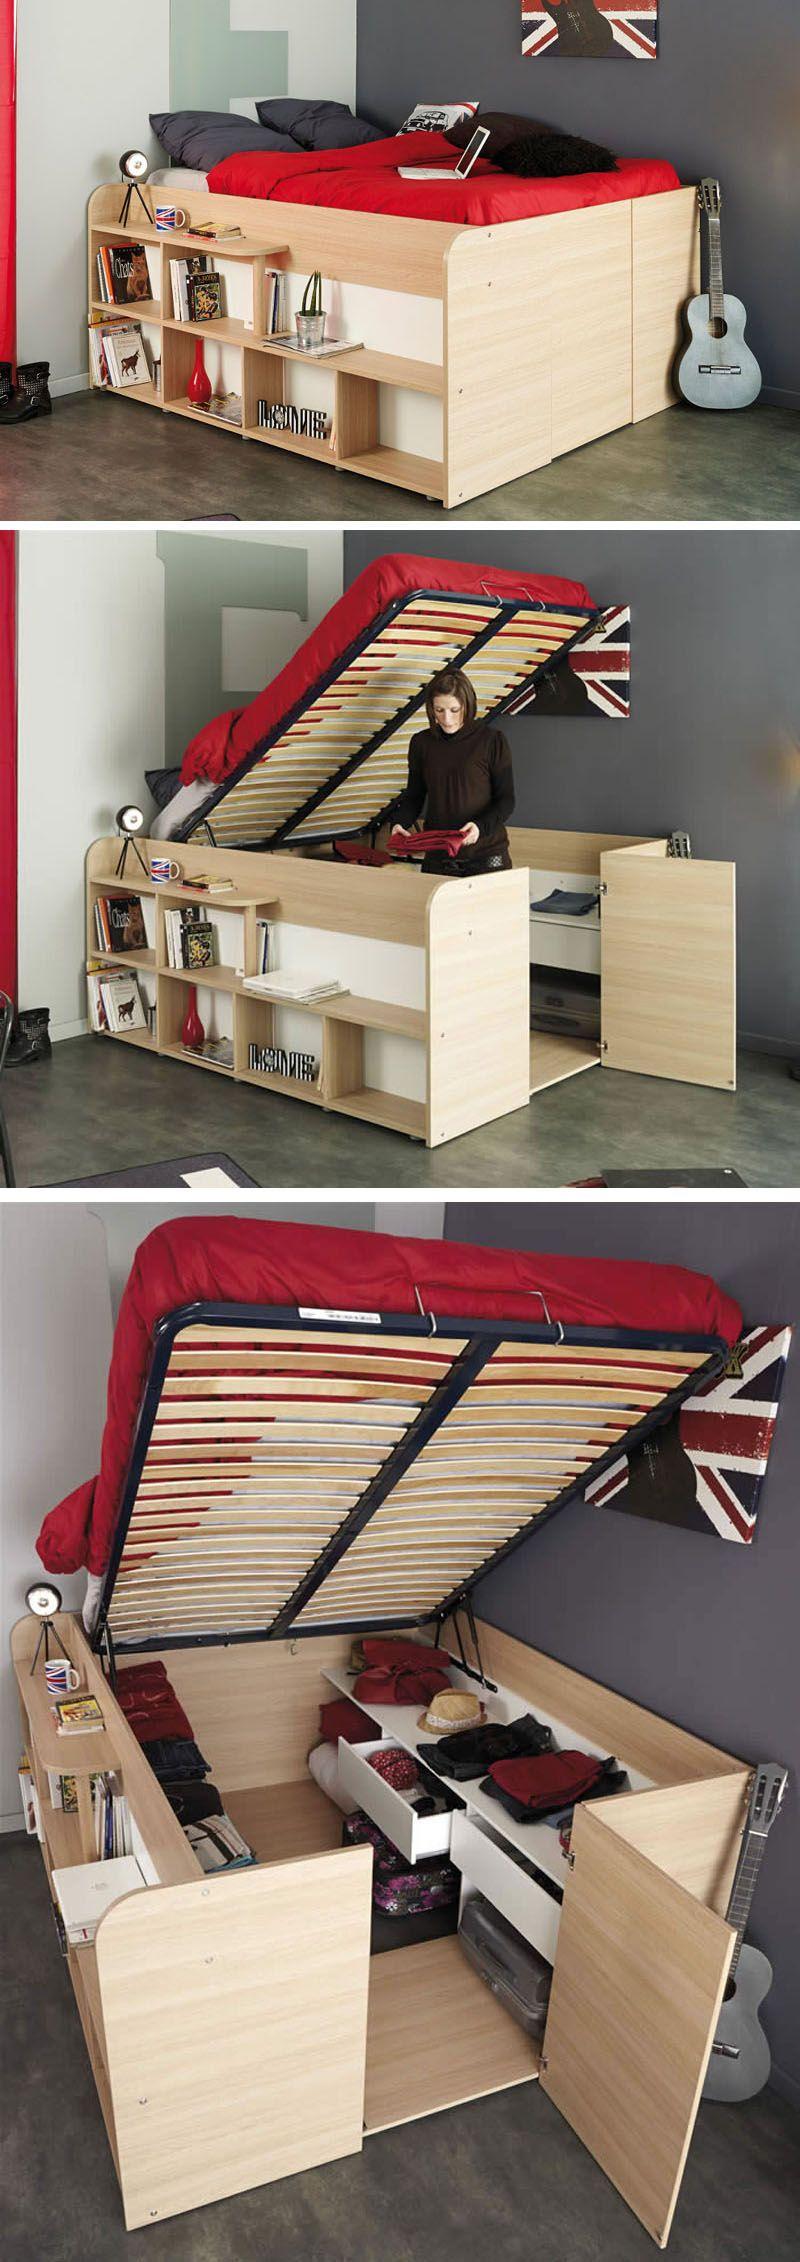 Duermo en mi tiempo libre design pinterest small space